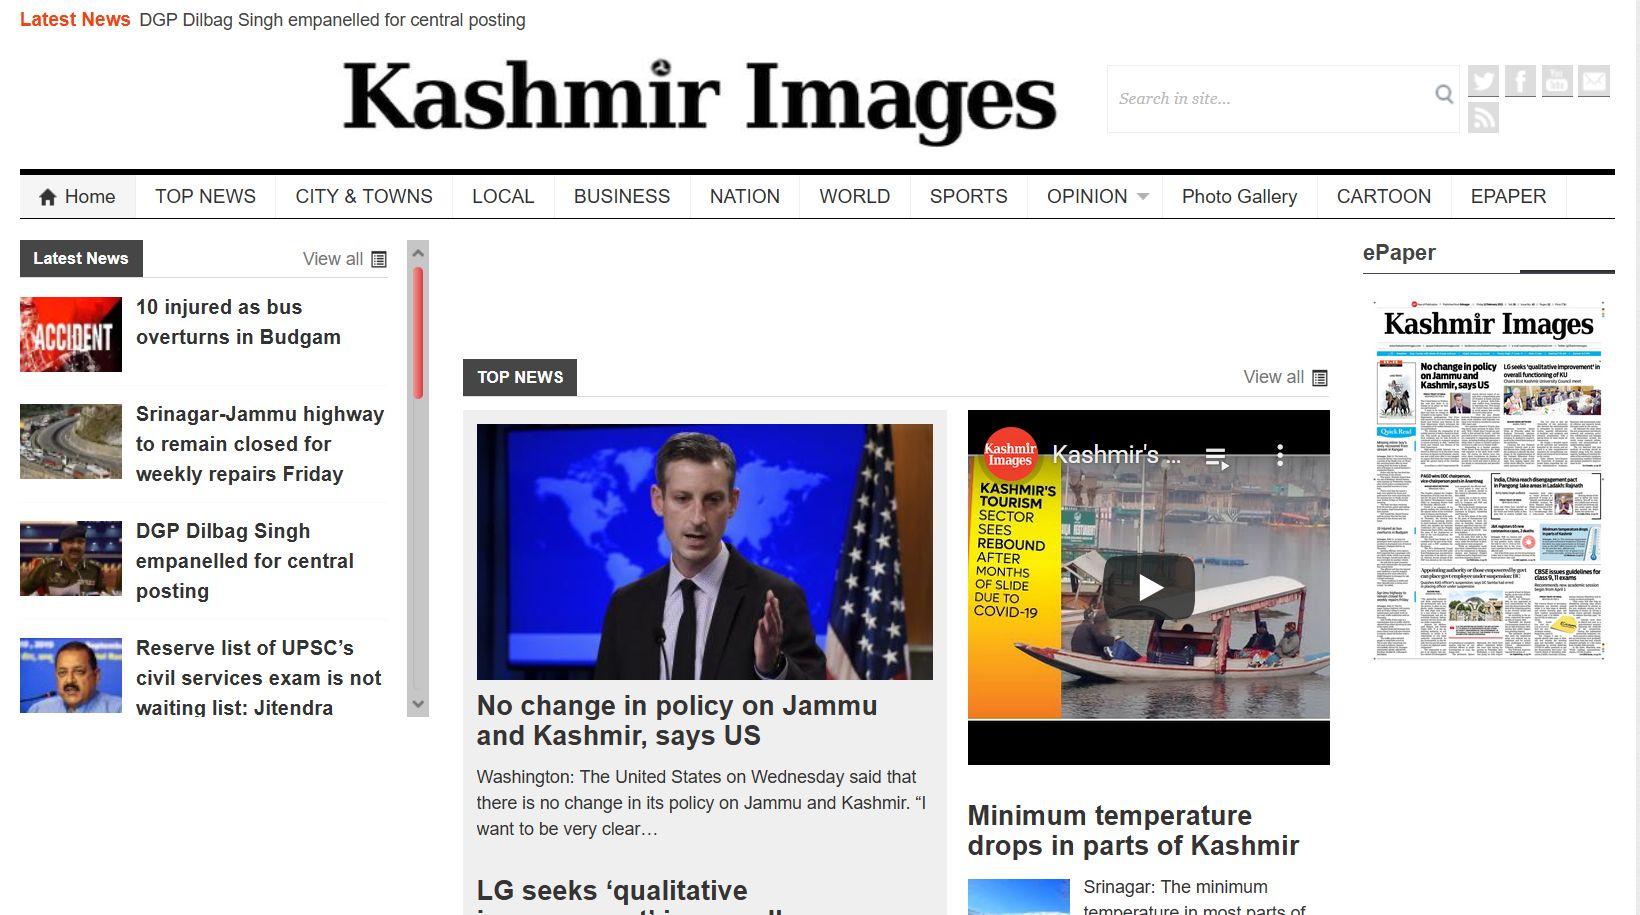 Kashmir Images